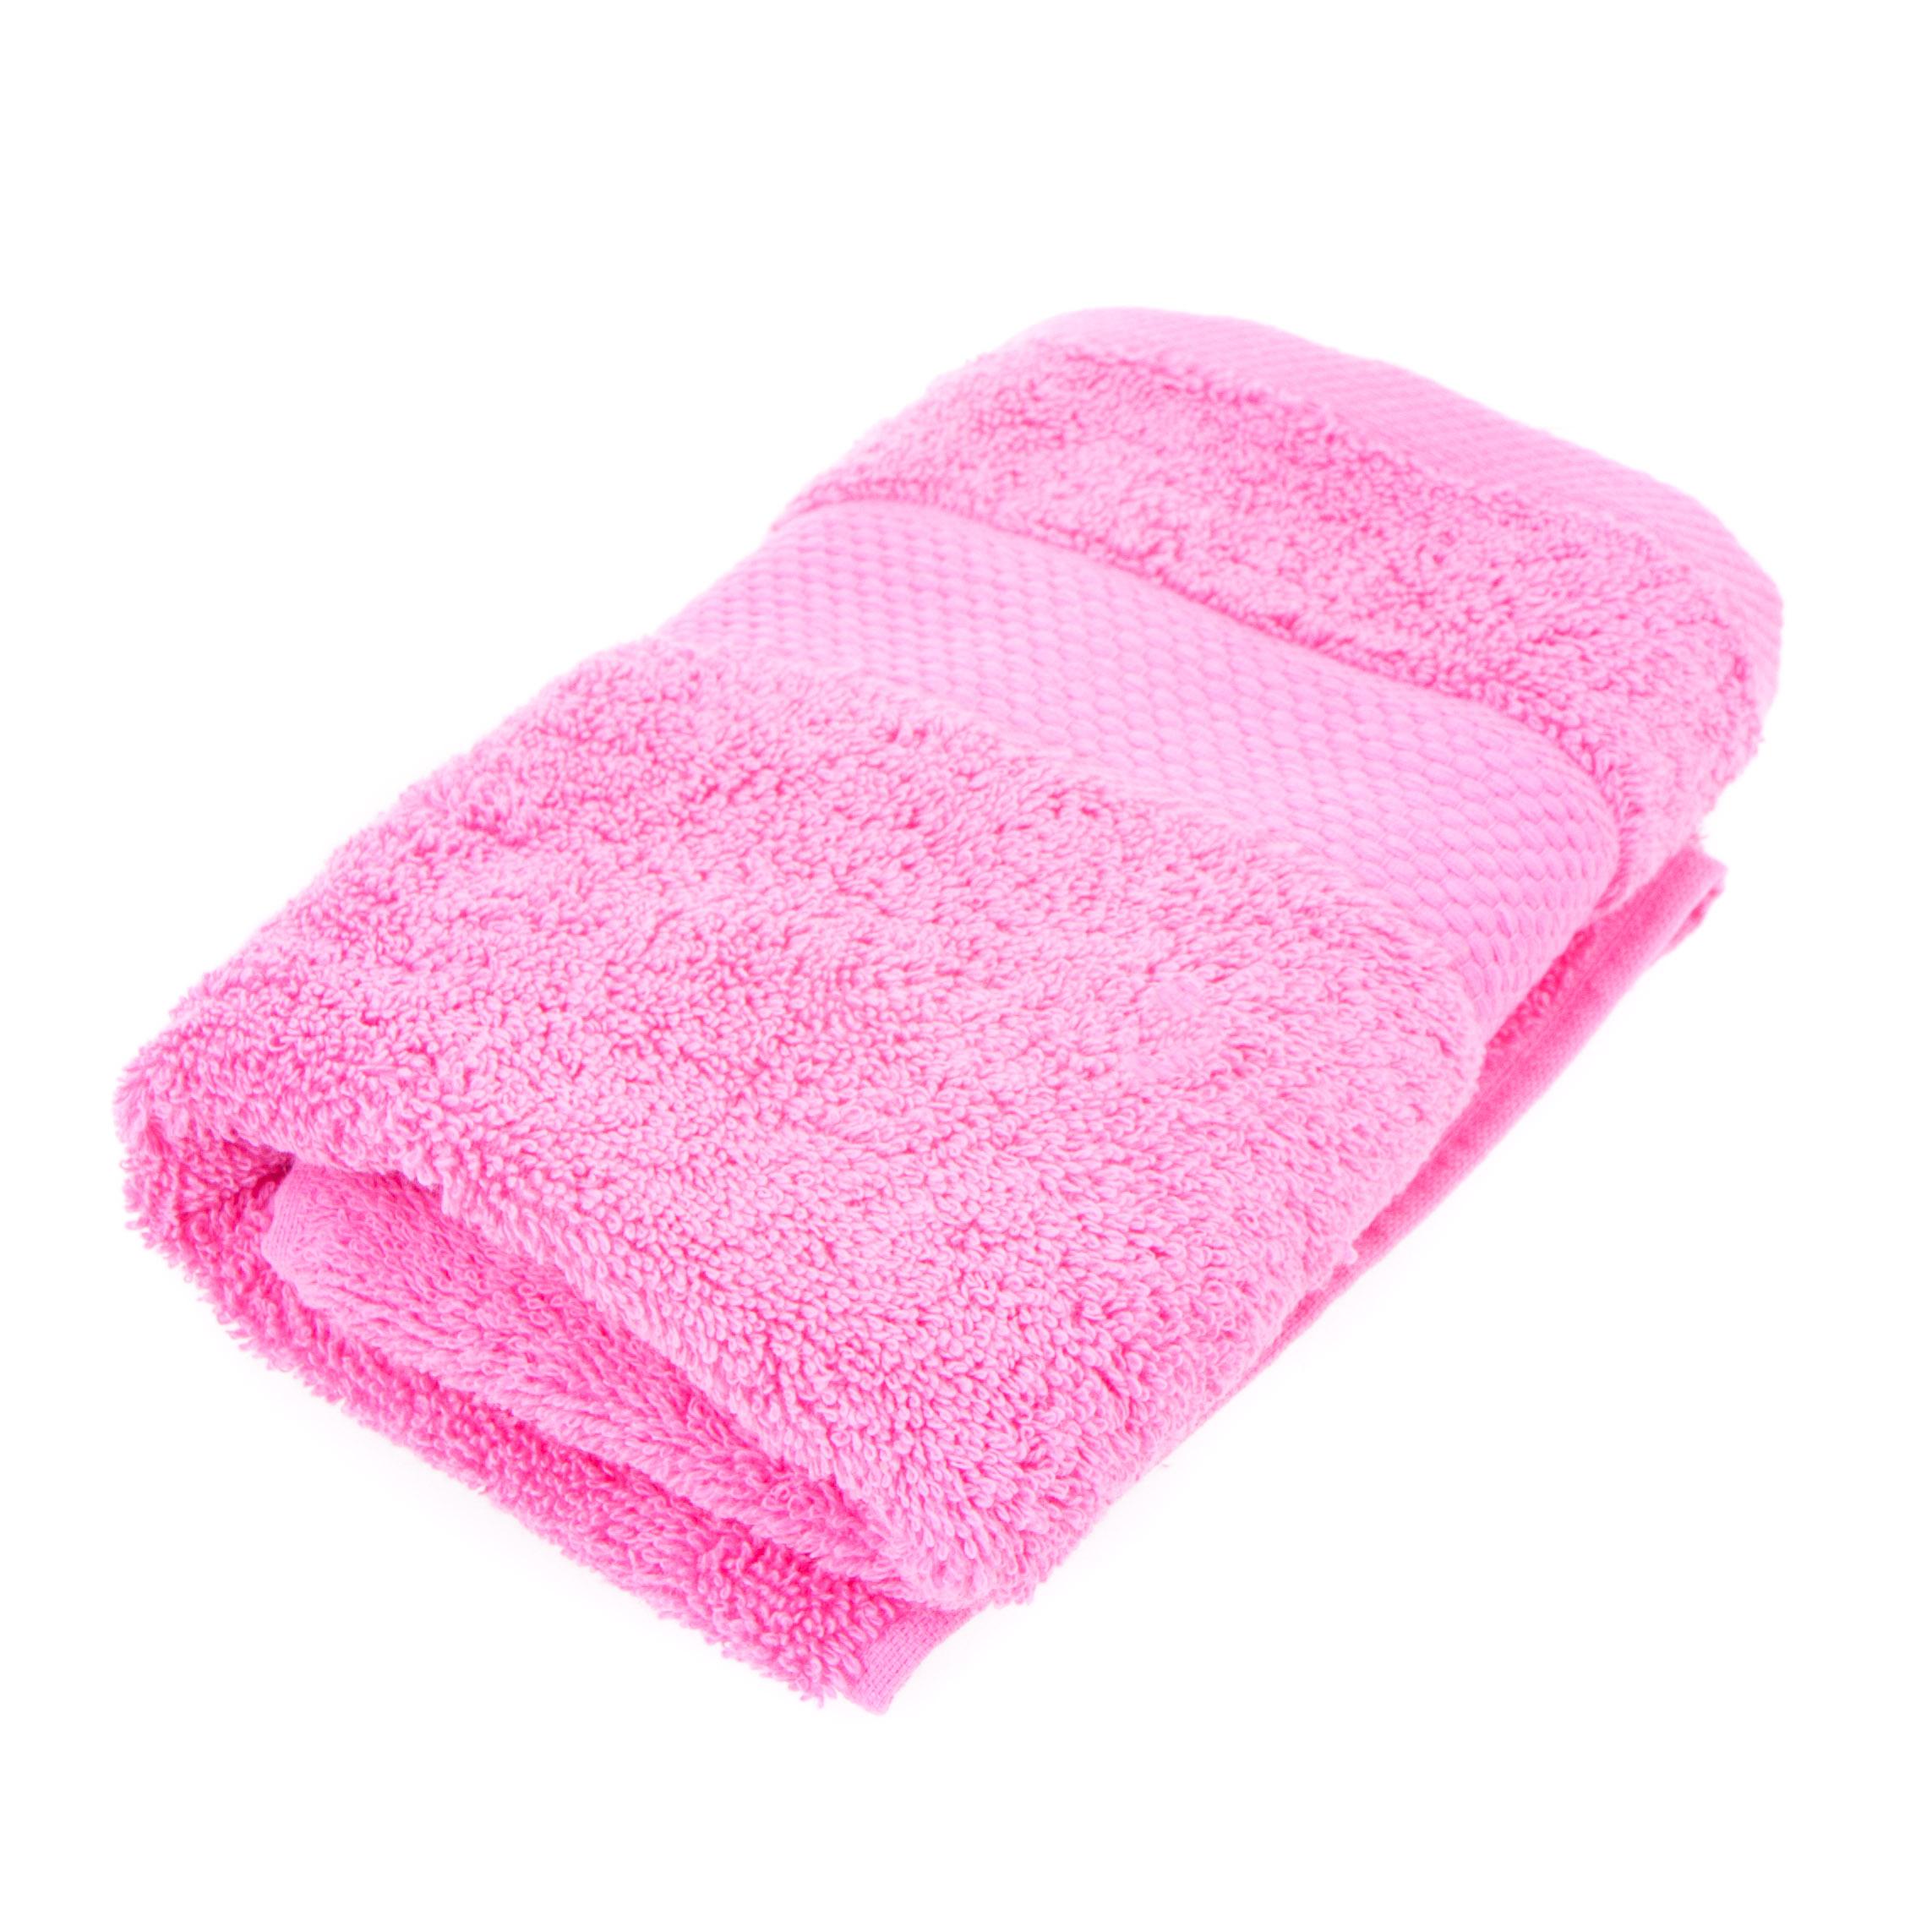 Фото - Полотенце махровое 100x150 pink Cogal полотенце valentini 100x150 aqua 1228